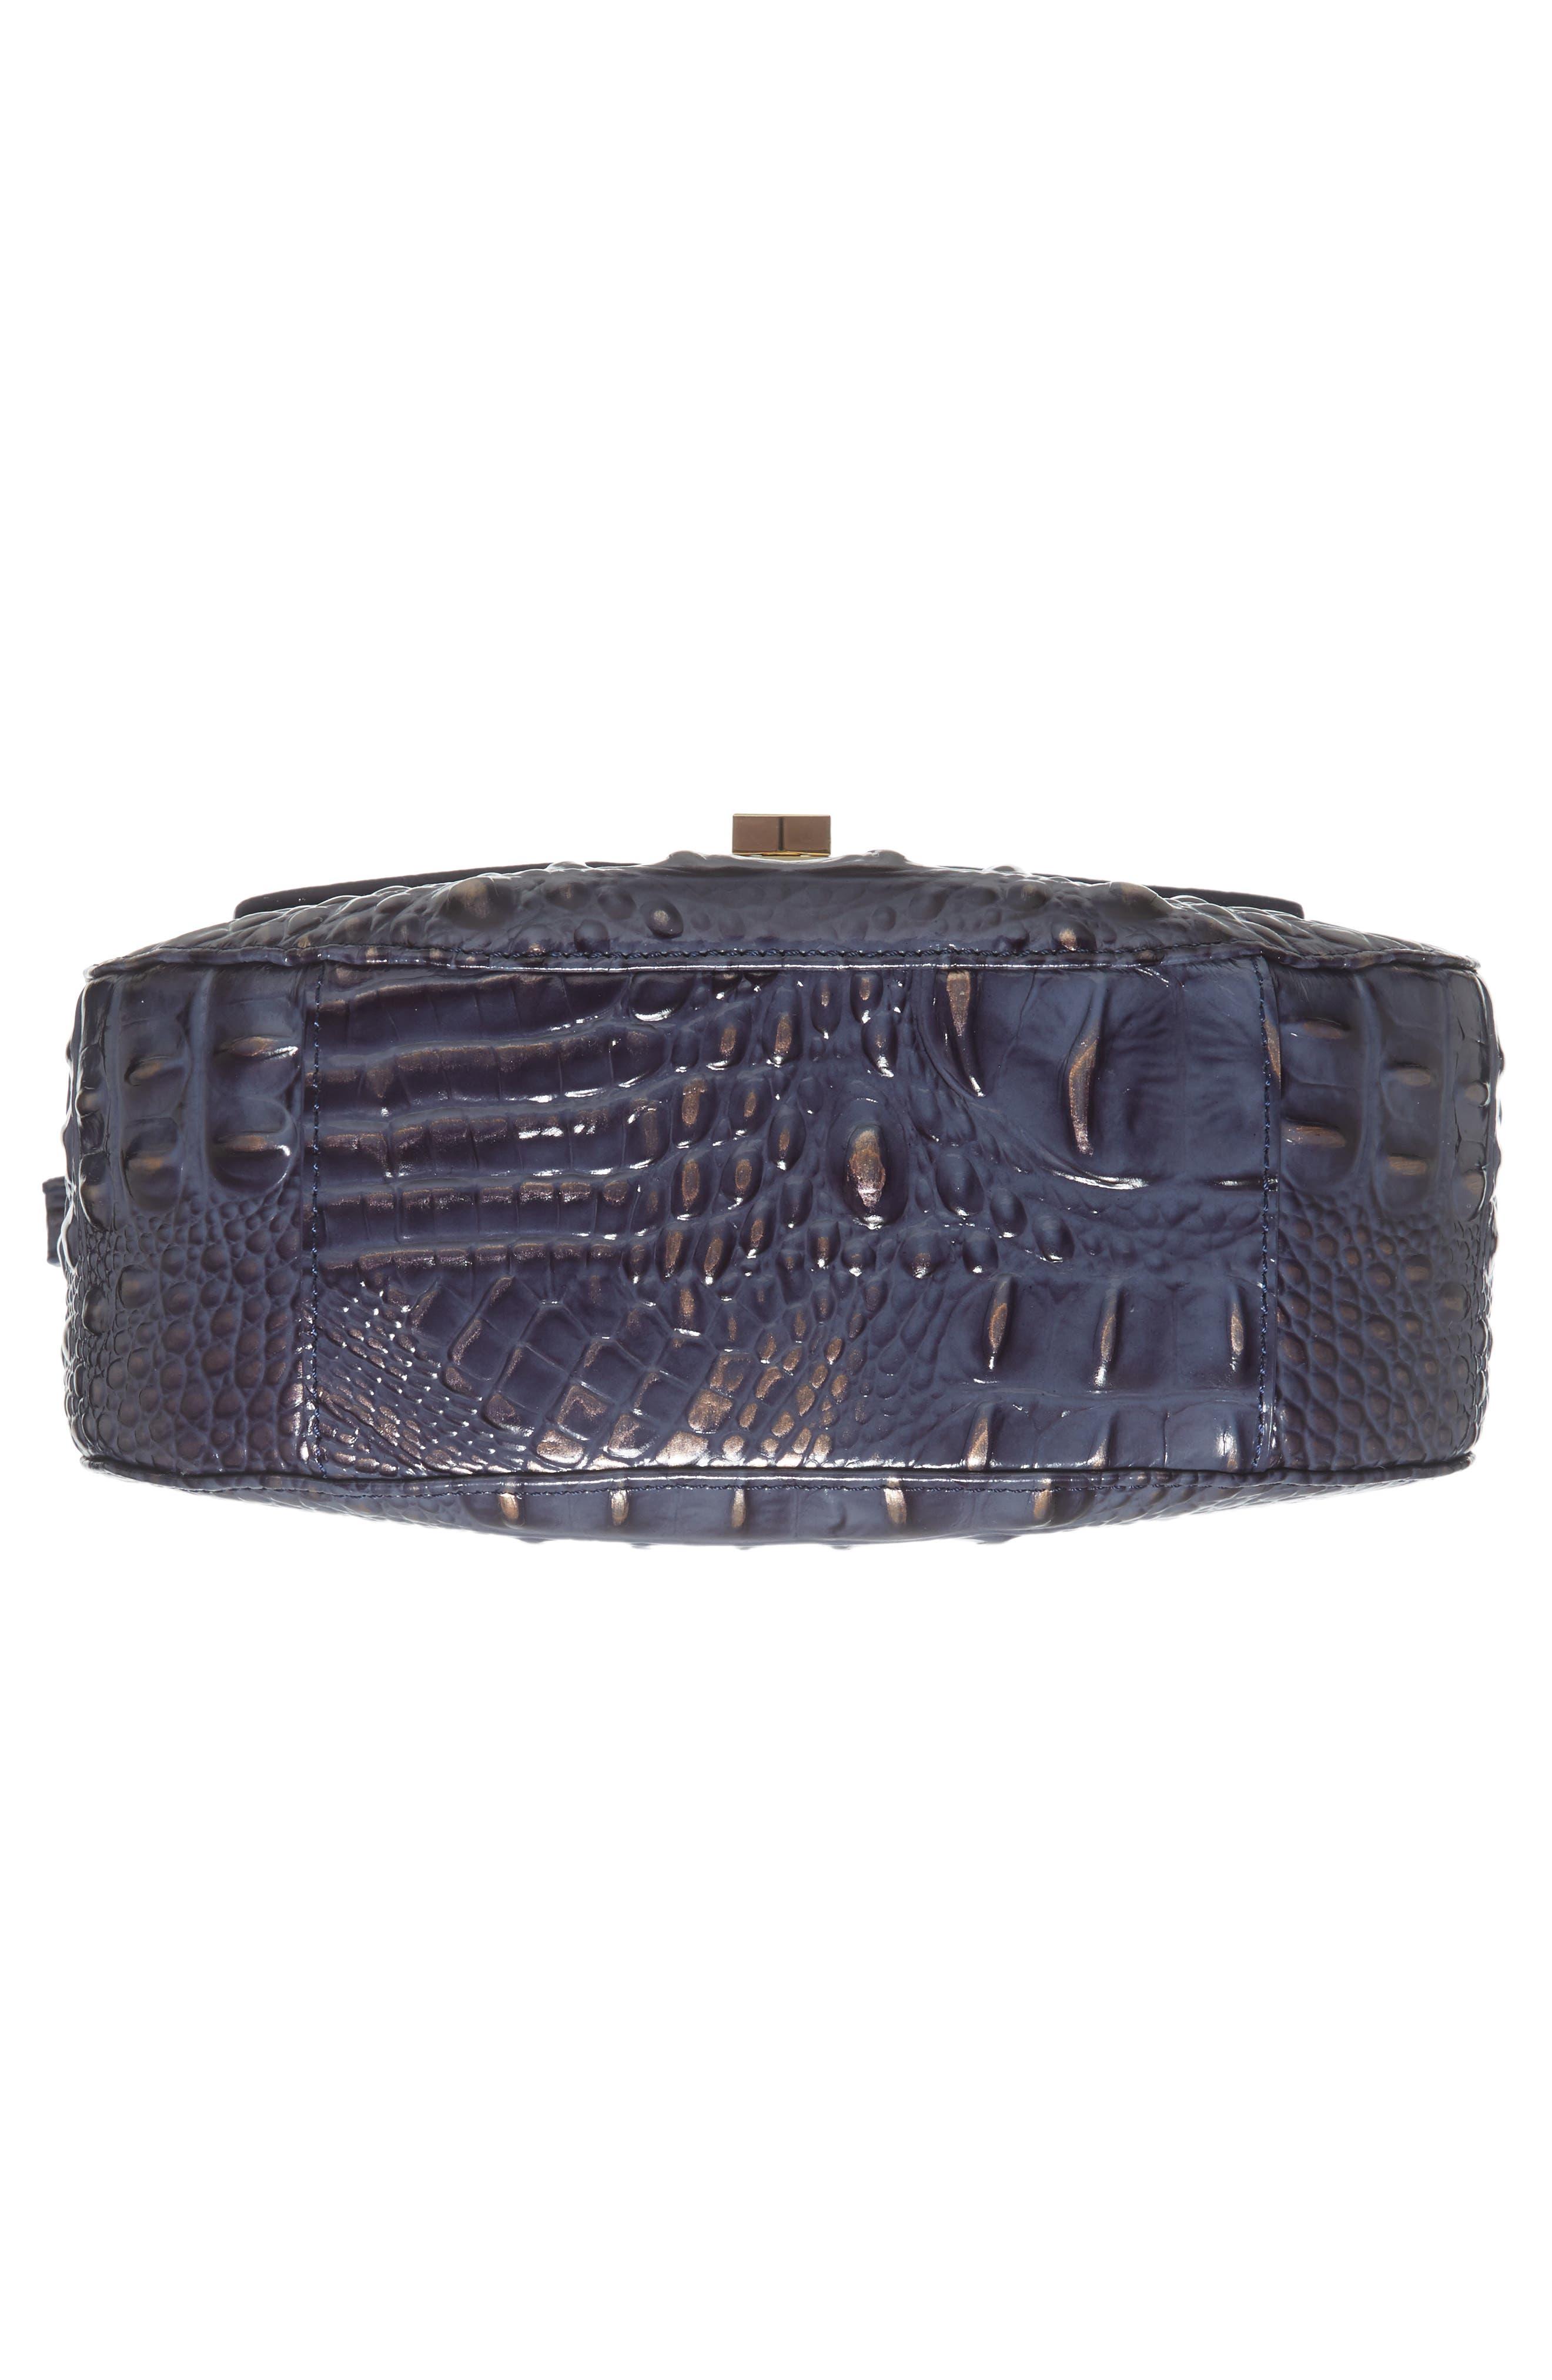 Melbourne - Lizzie Leather Crossbody Bag,                             Alternate thumbnail 29, color,